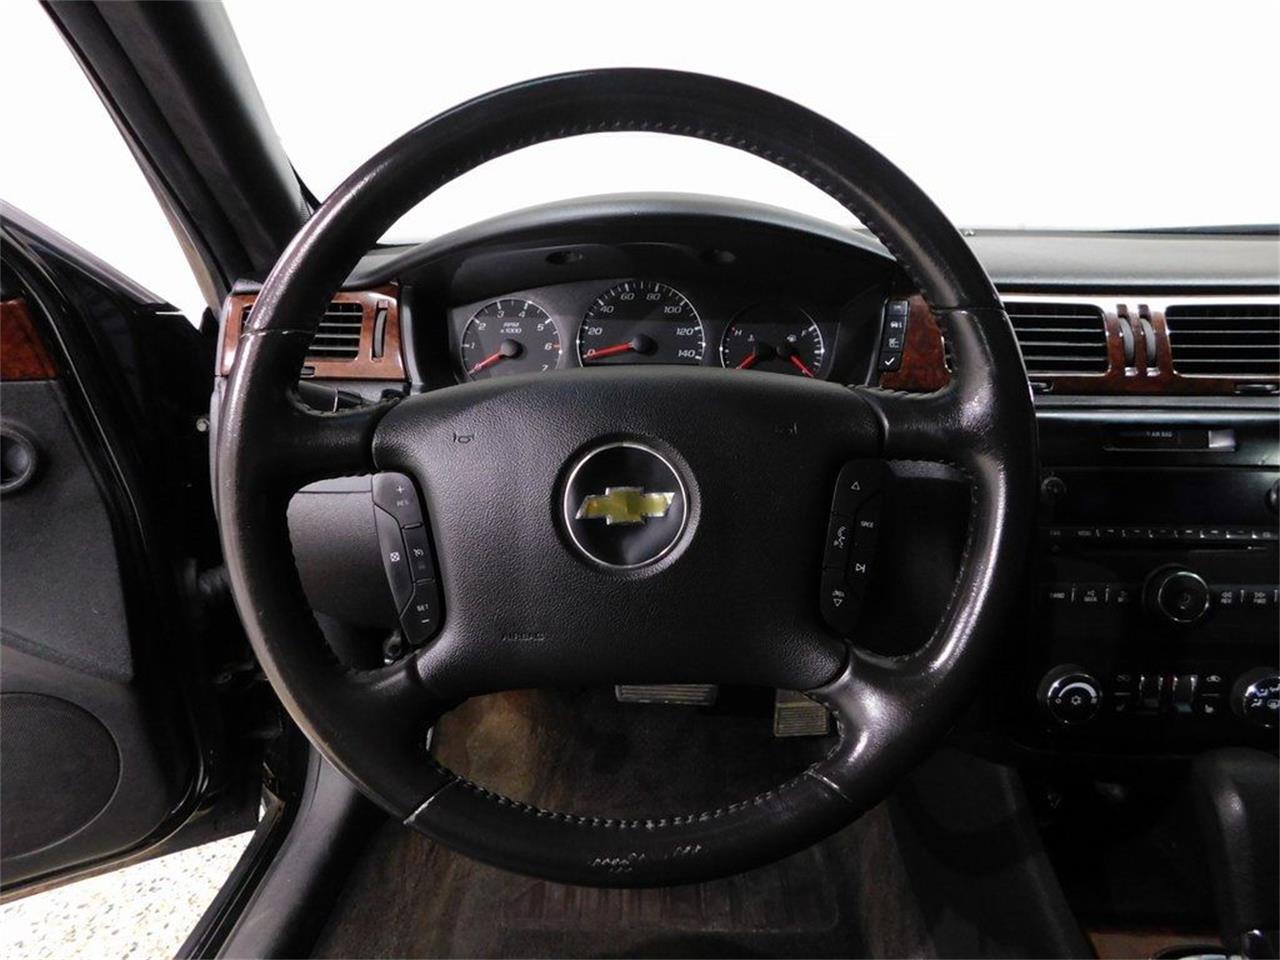 2011 Chevrolet Impala (CC-1421783) for sale in Hamburg, New York